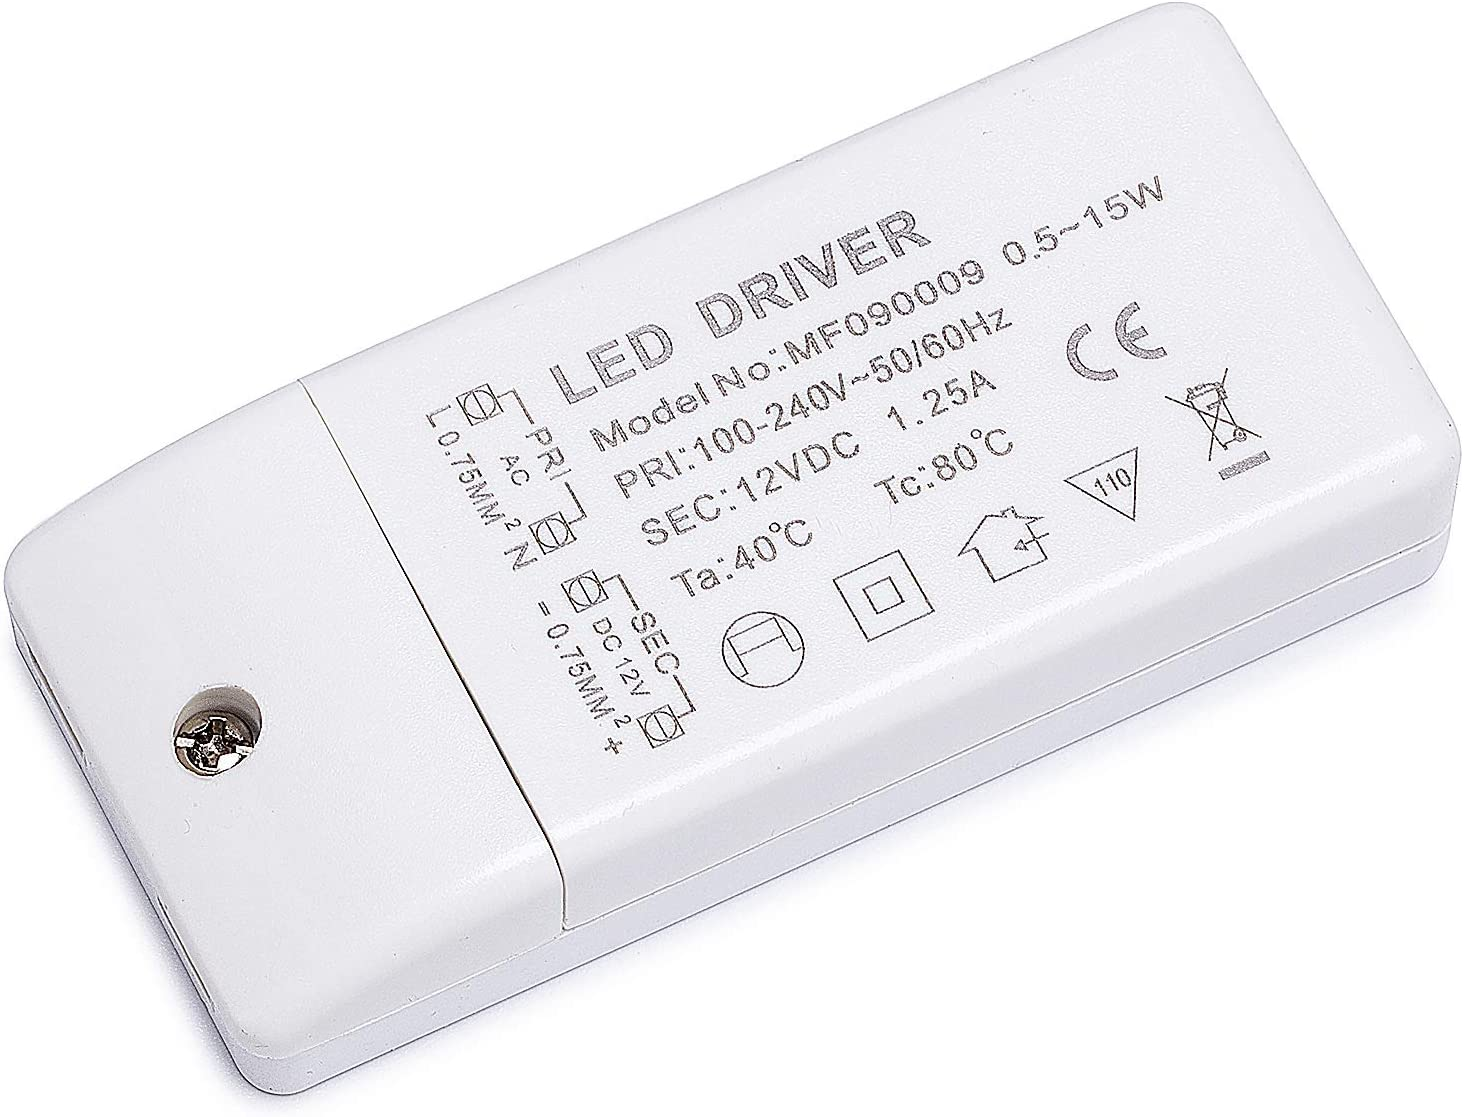 Yafido LED Transformador 220V (AC) a 12V (DC) Trafo 0,5-15W 1,25A LED Driver Fuente de Alimentación para Bajo Voltaje Bombillas G4 MR16 GU5.3 MR11 Tira LED